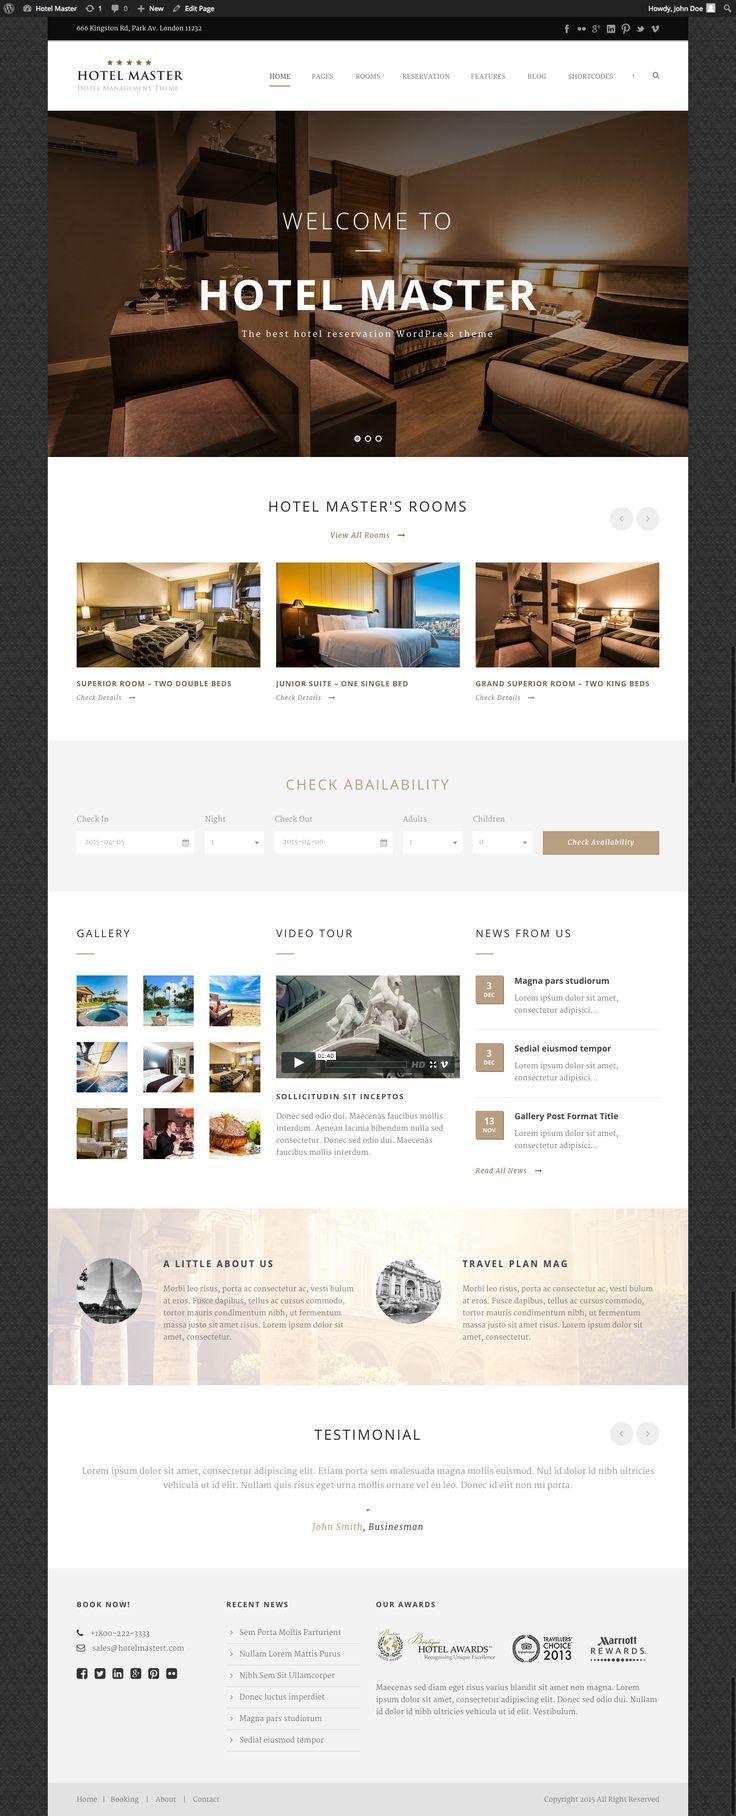 Hotel Master Hotel & Hostel Booking WordPress Theme - Download theme here : http://themeforest.net/item/hotel-master-hotel-hostel-booking-wordpress-theme/11032879?ref=pxcr